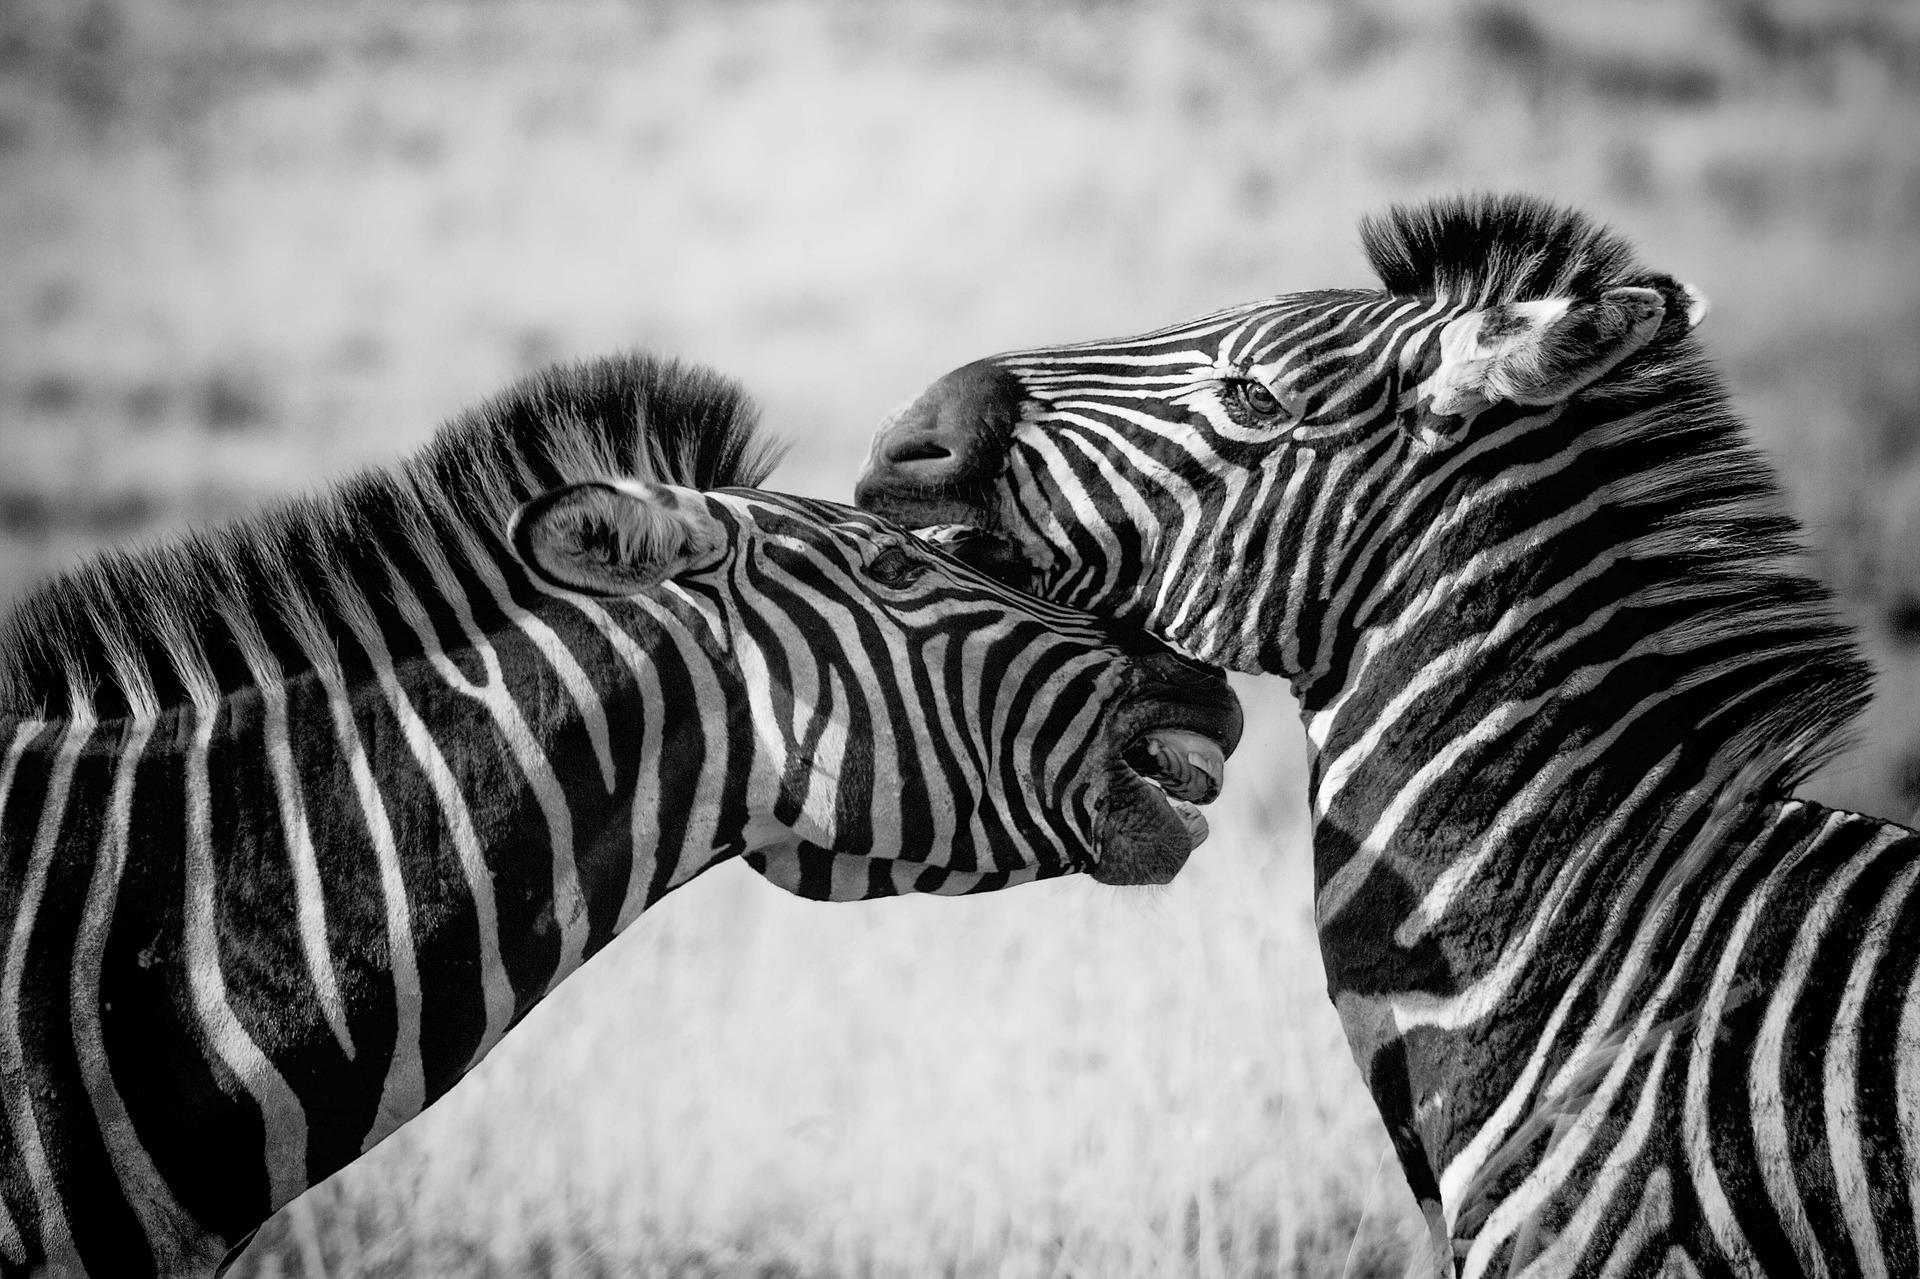 download wallpaper: zebra's wallpaper